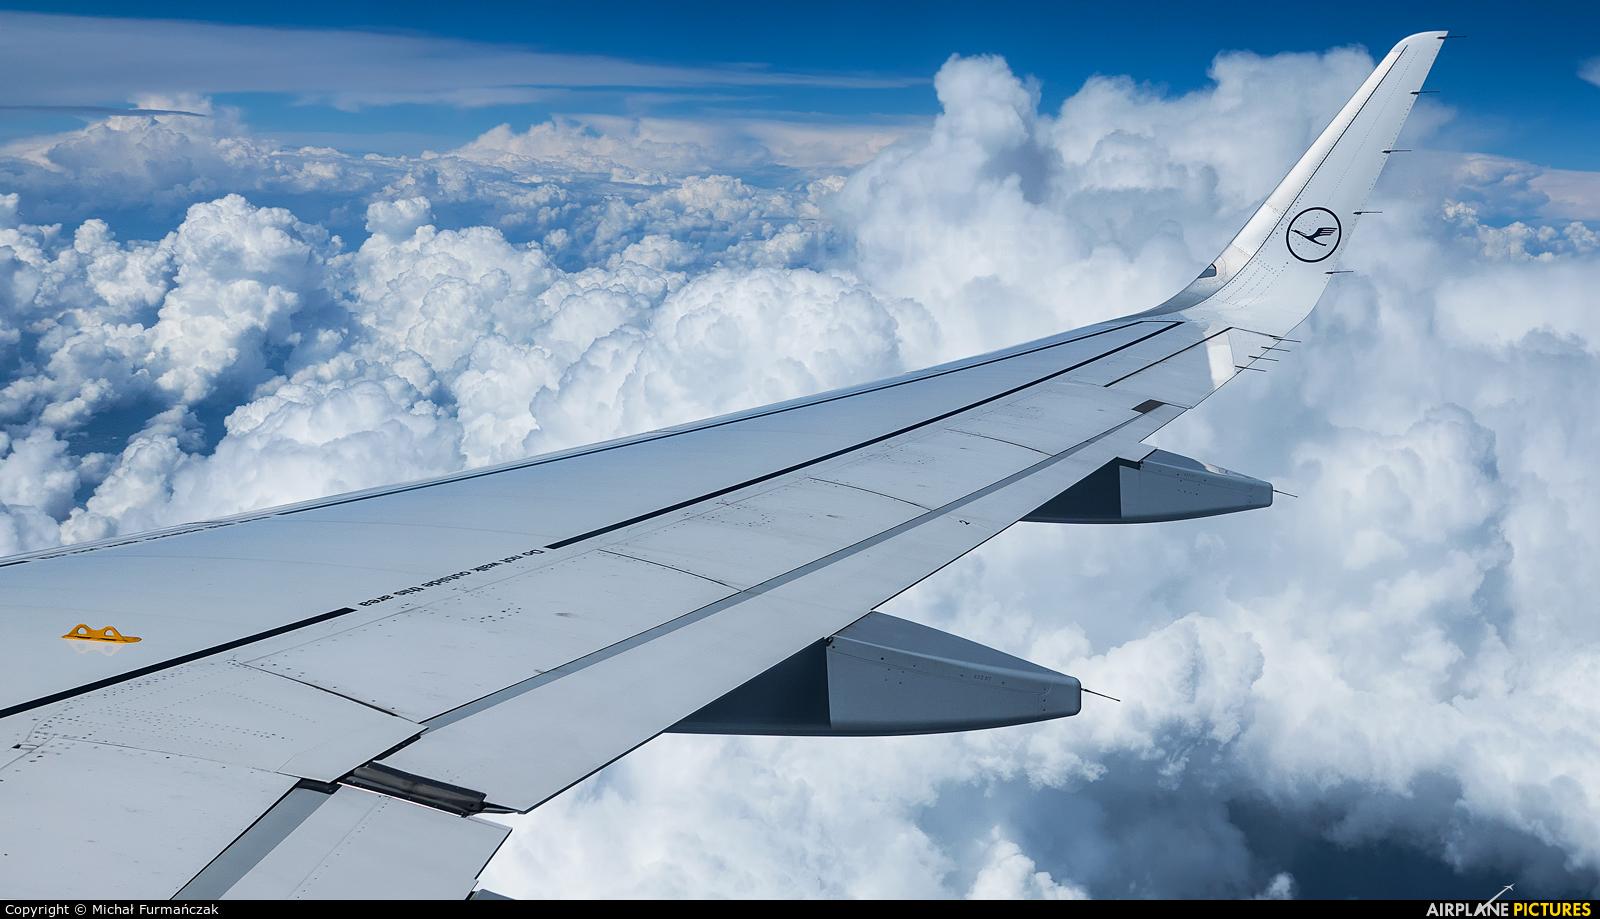 Lufthansa D-AIUH aircraft at In Flight - International